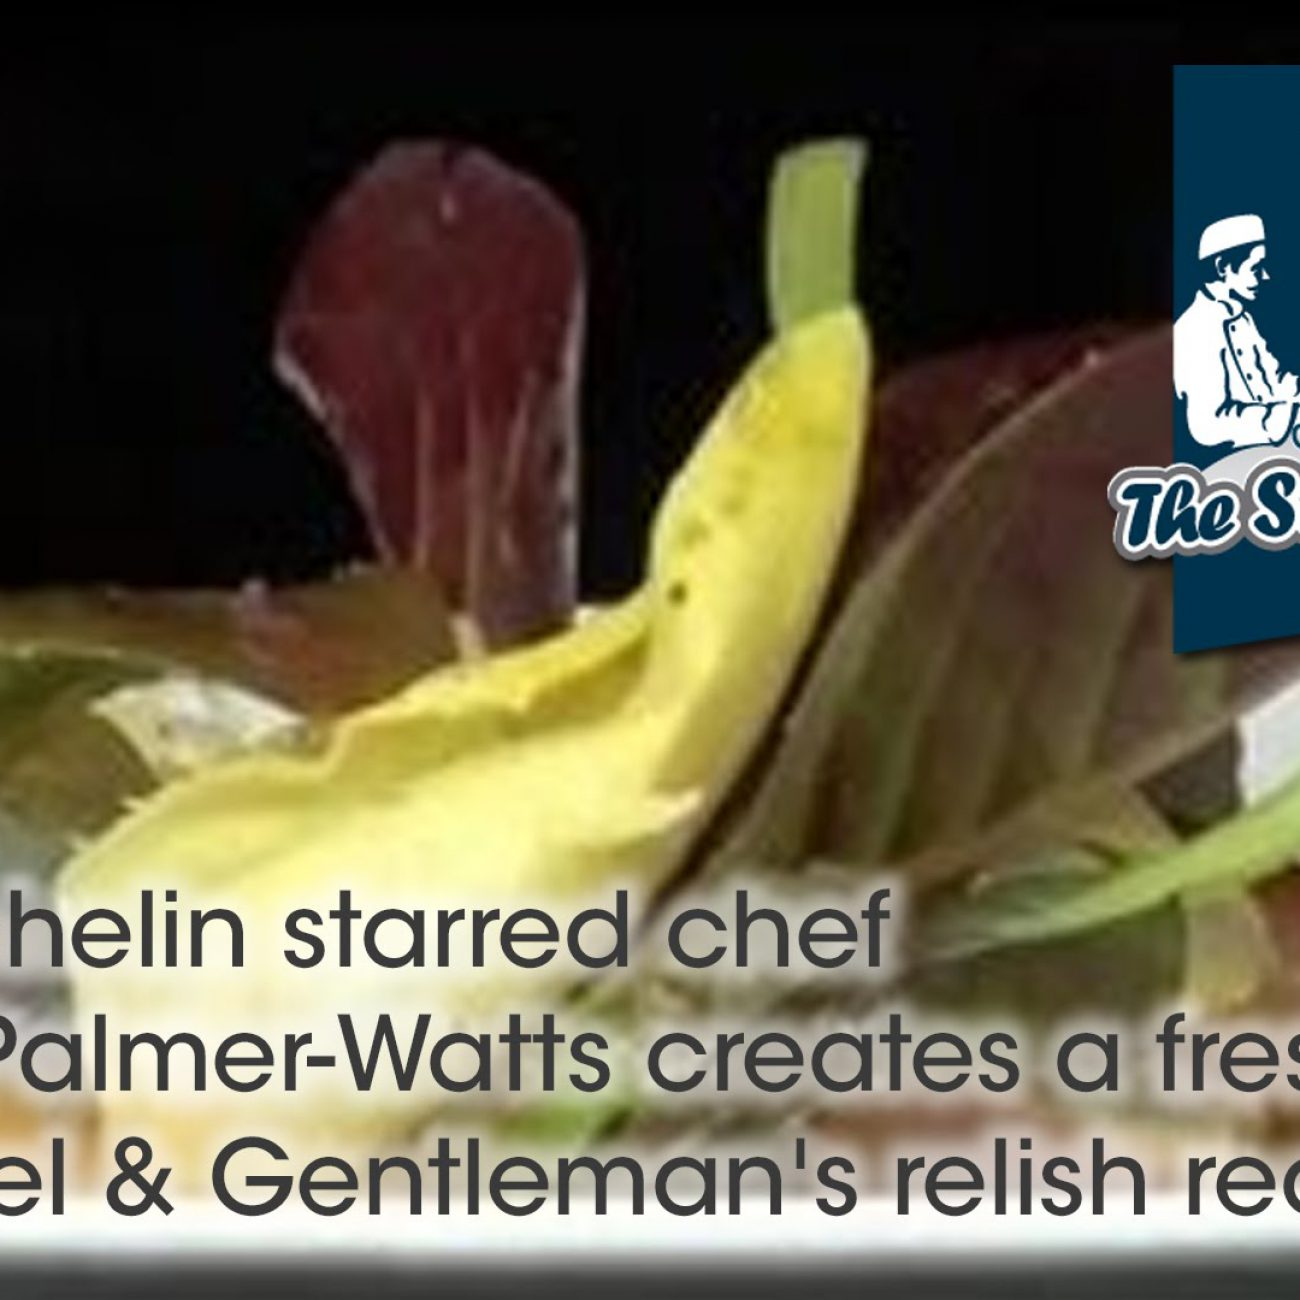 Two Michelin starred chef Ashley Palmer-Watts creates a fresh mackerel & Gentleman's relish recipe